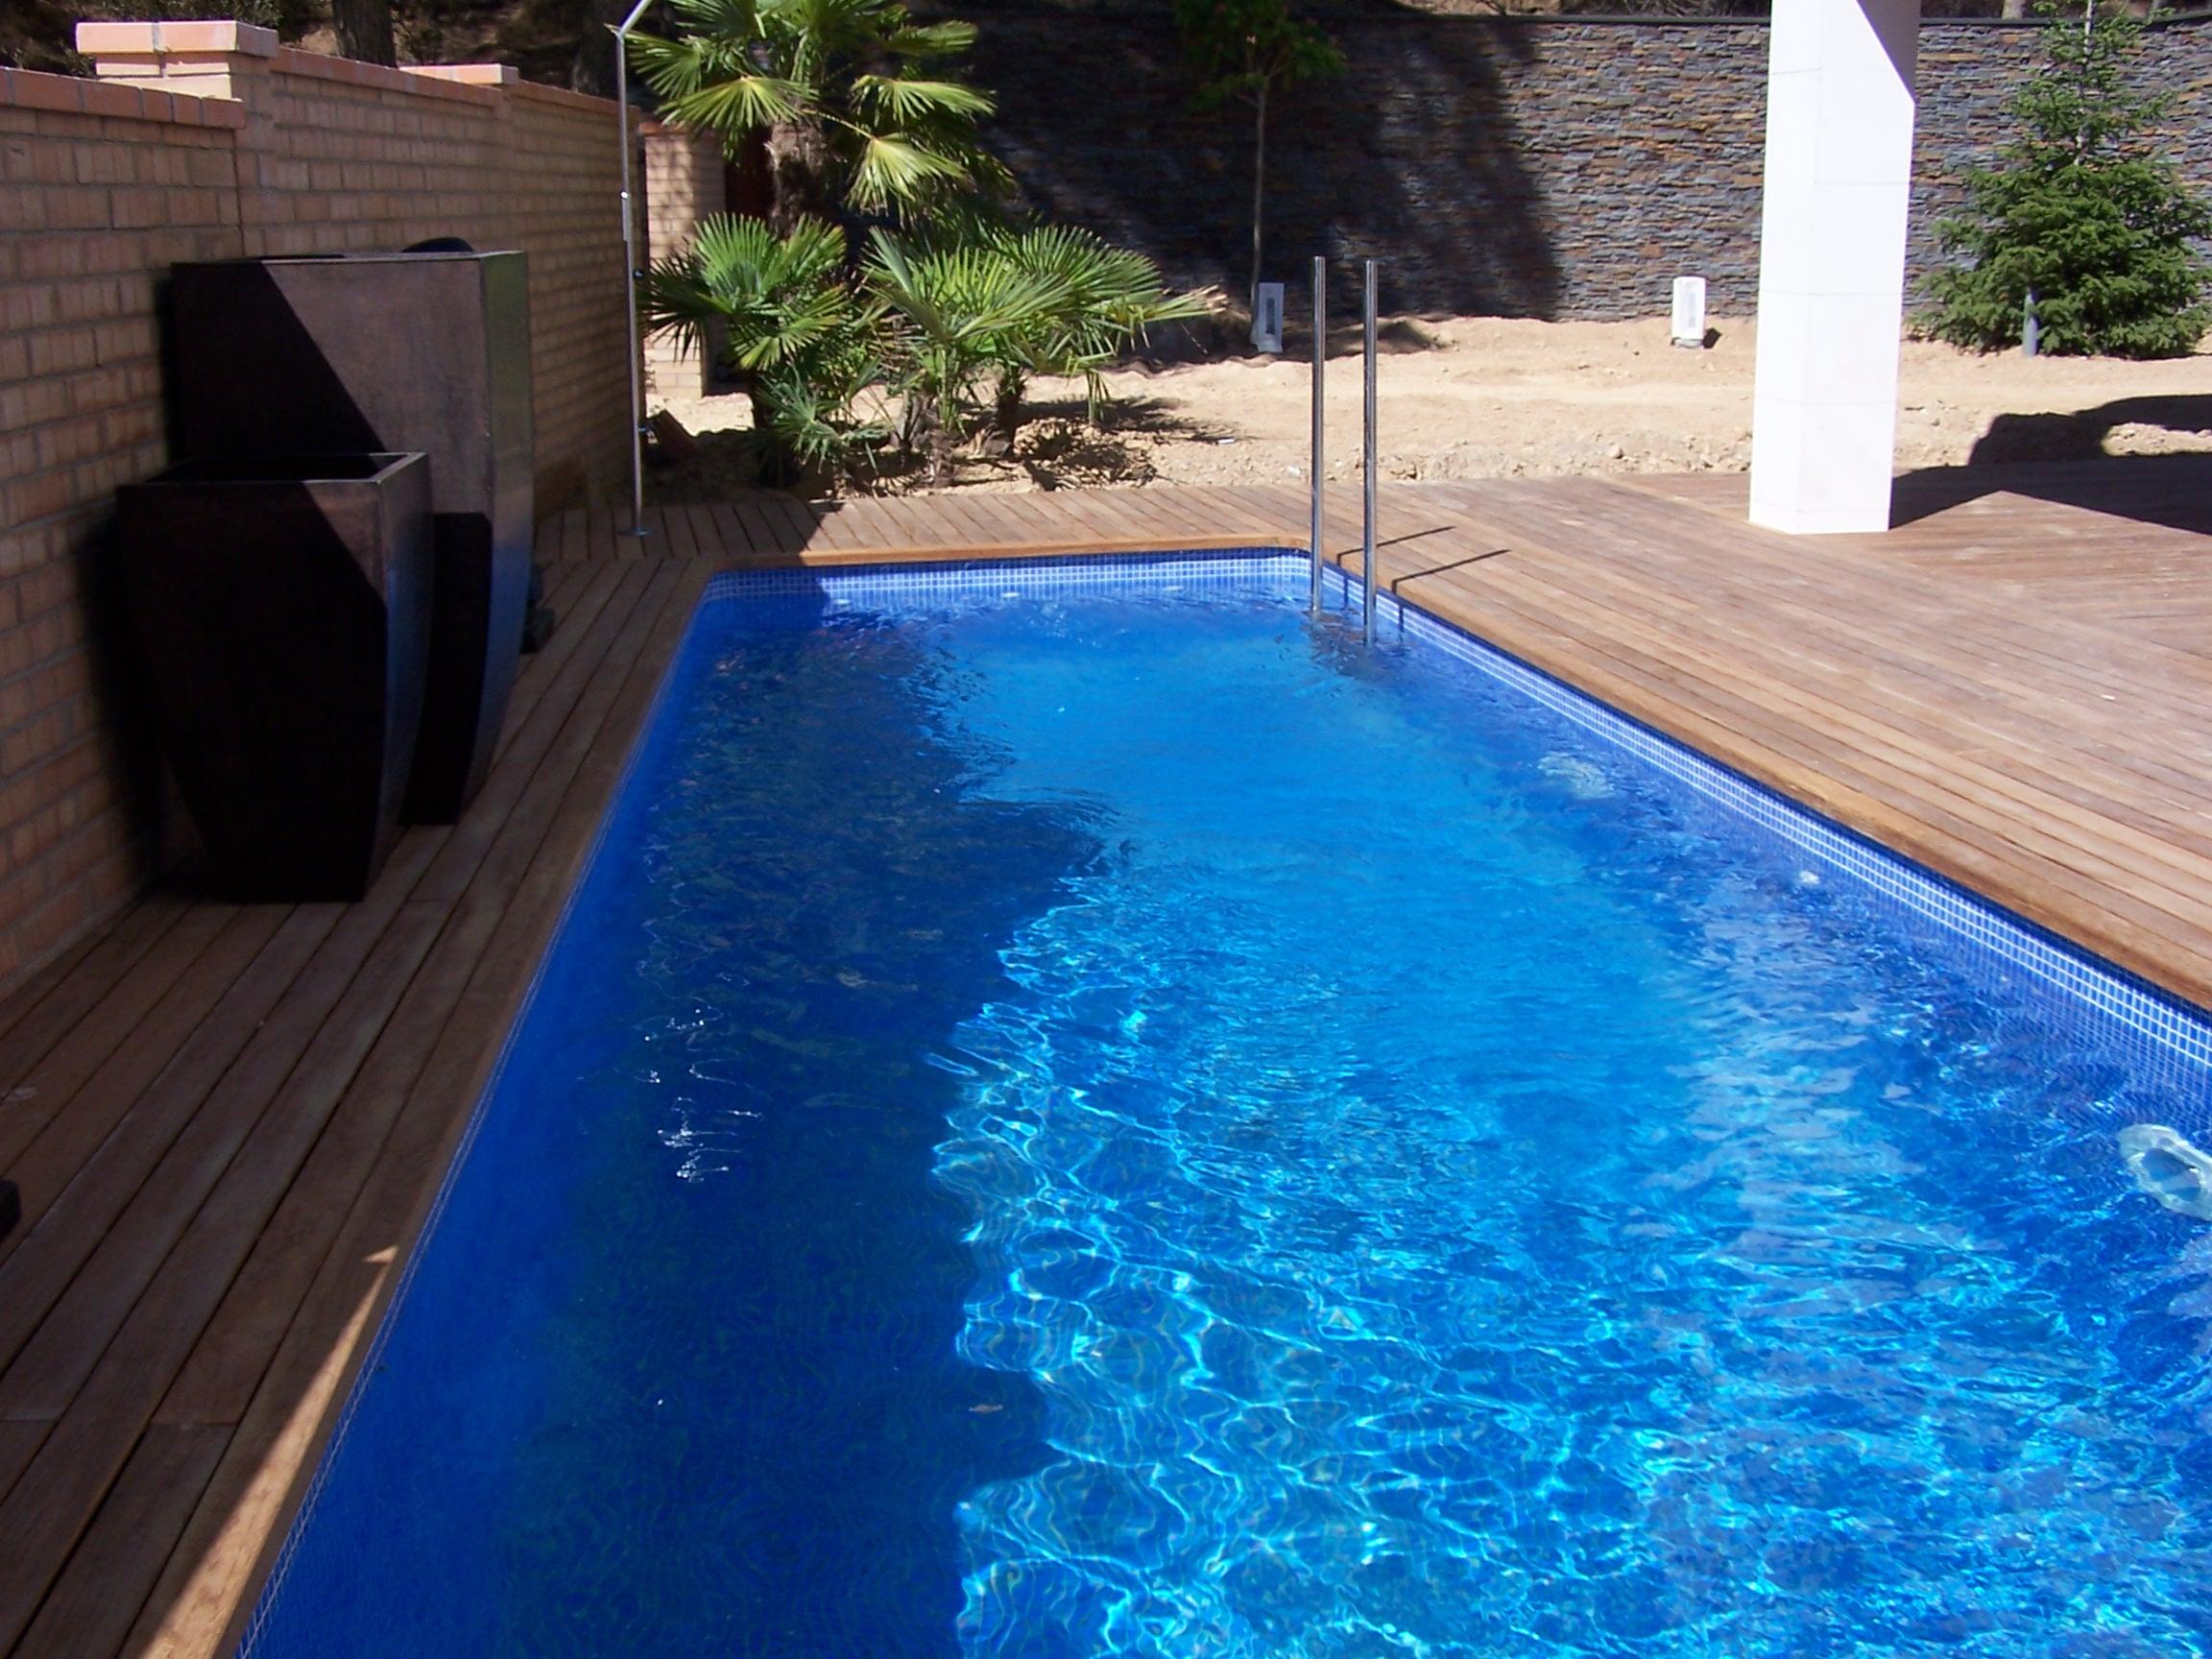 Piscinas de obra codetrac s l expertos en piscinas for Piscinas de obra